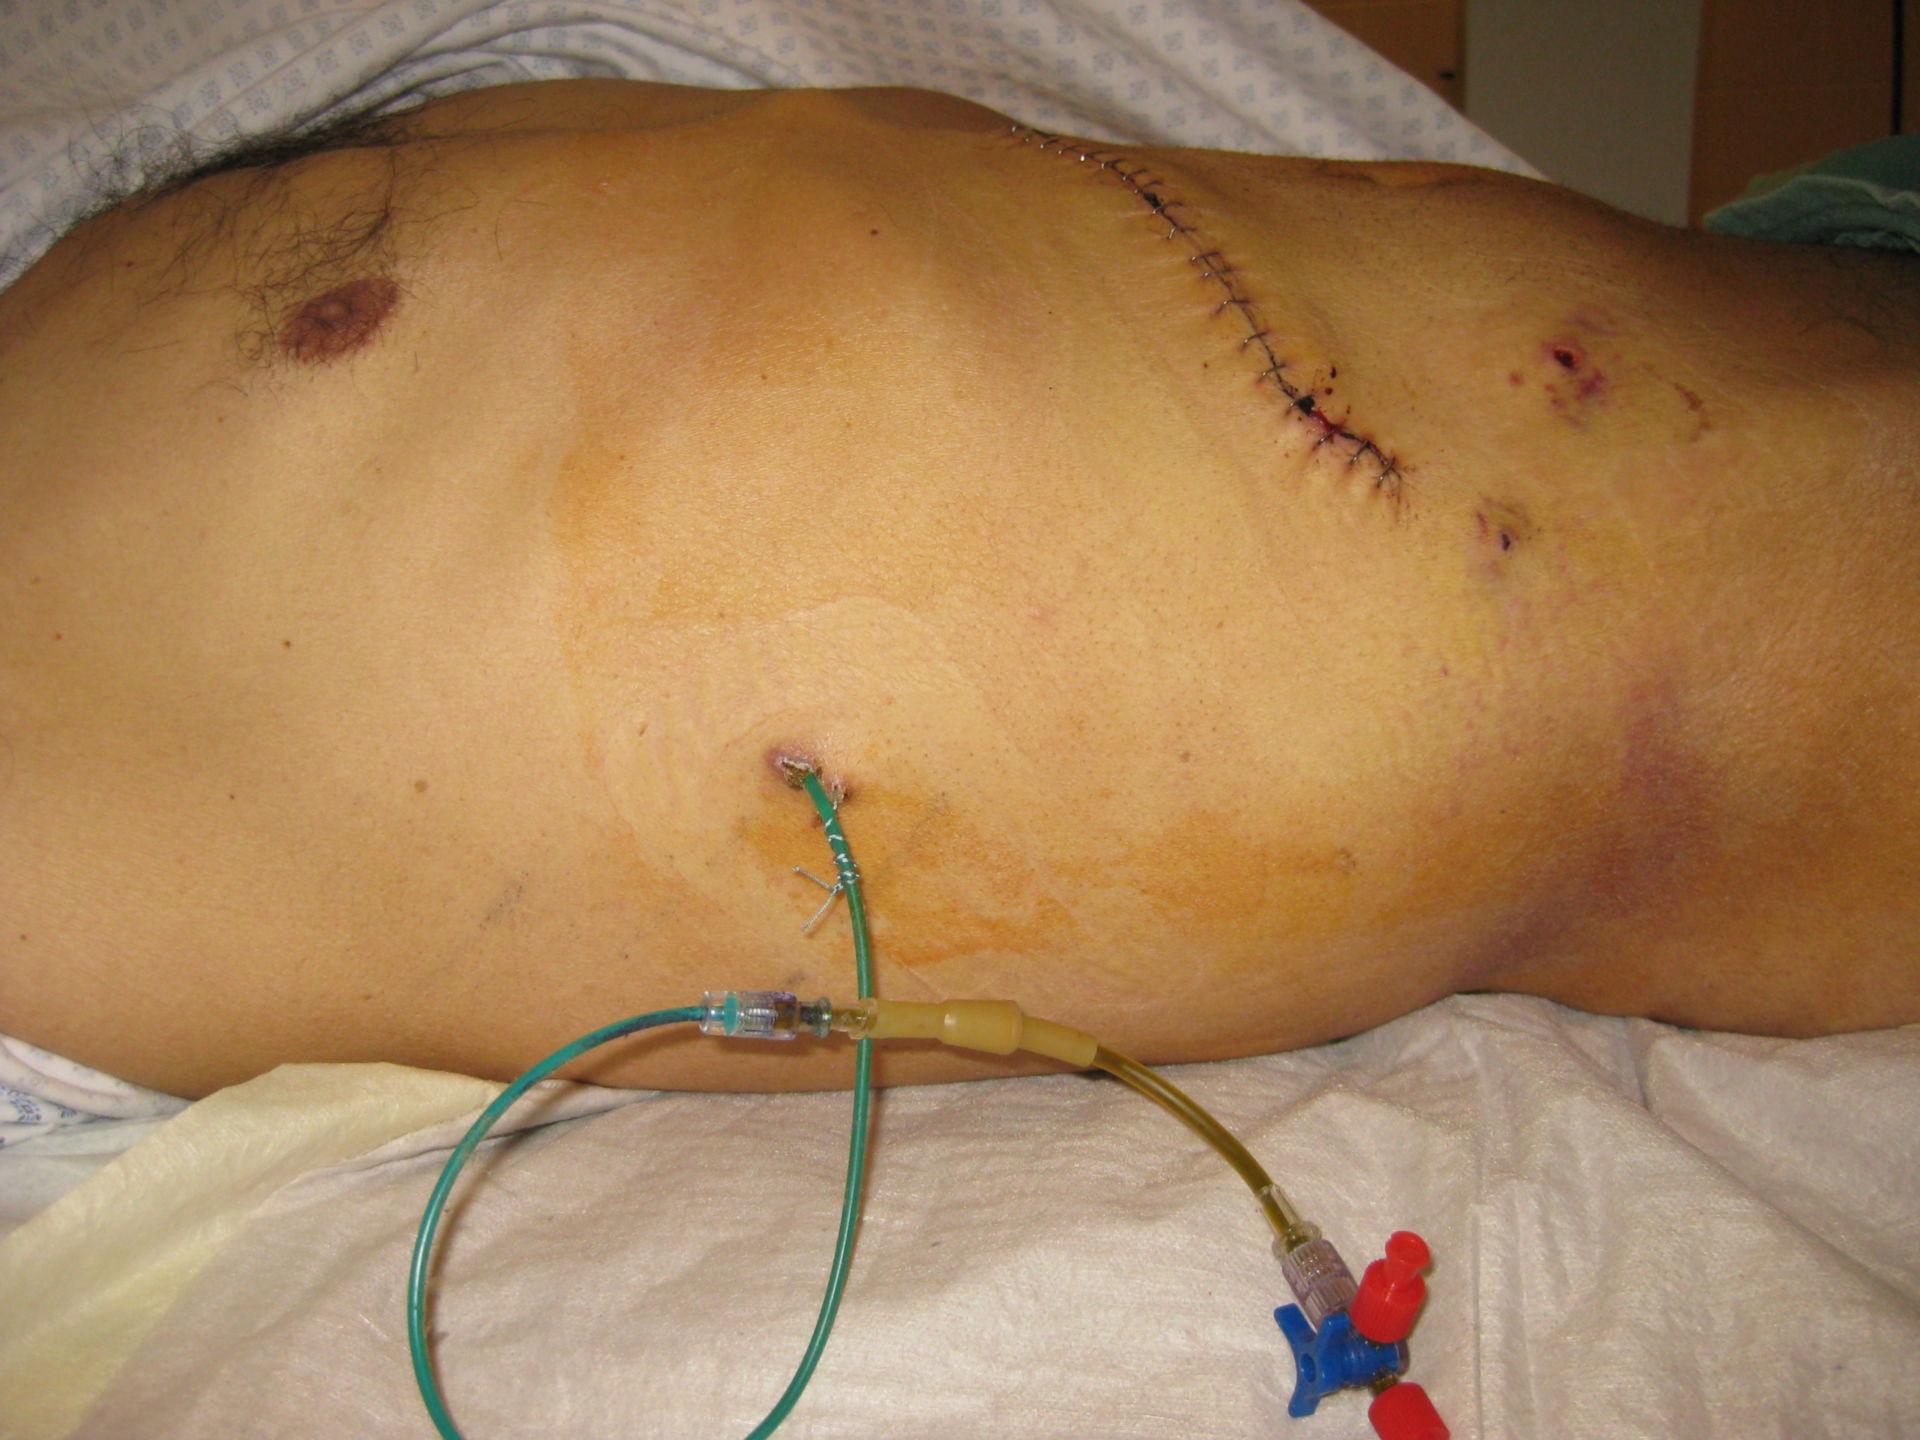 Percutaneous transhepatic cholangio drainage